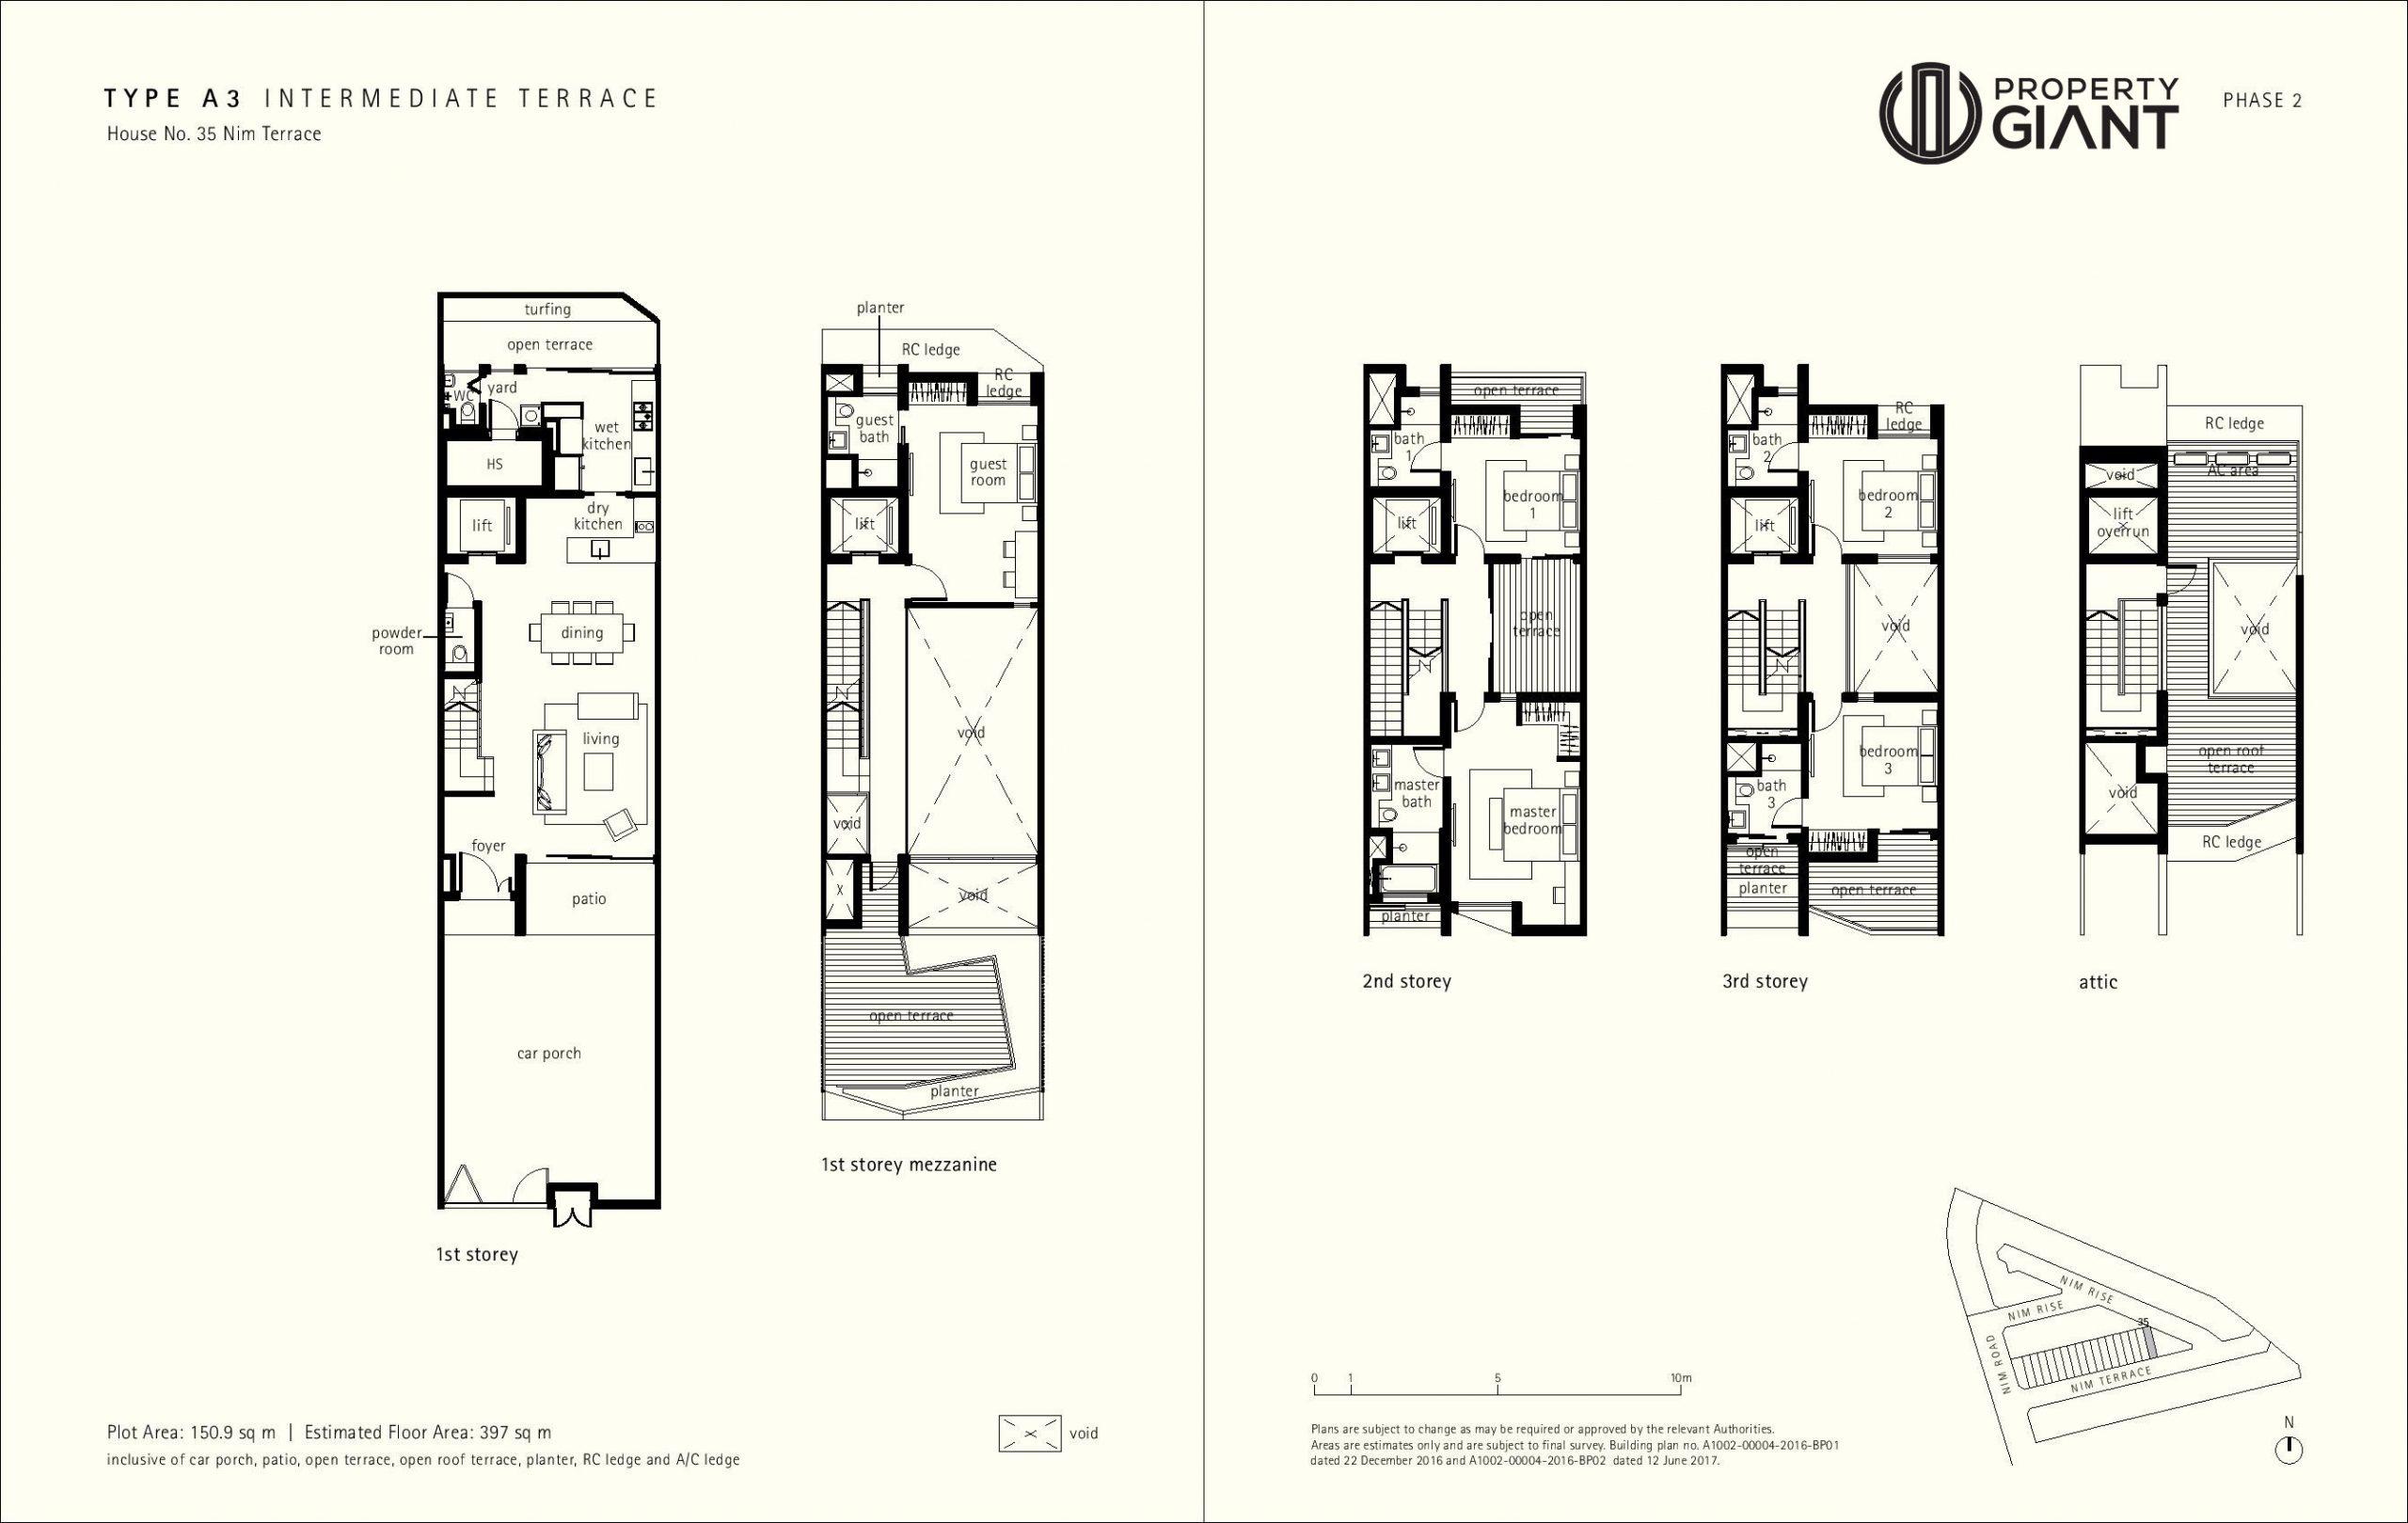 Type A3 - No. 35 Nim Terrace